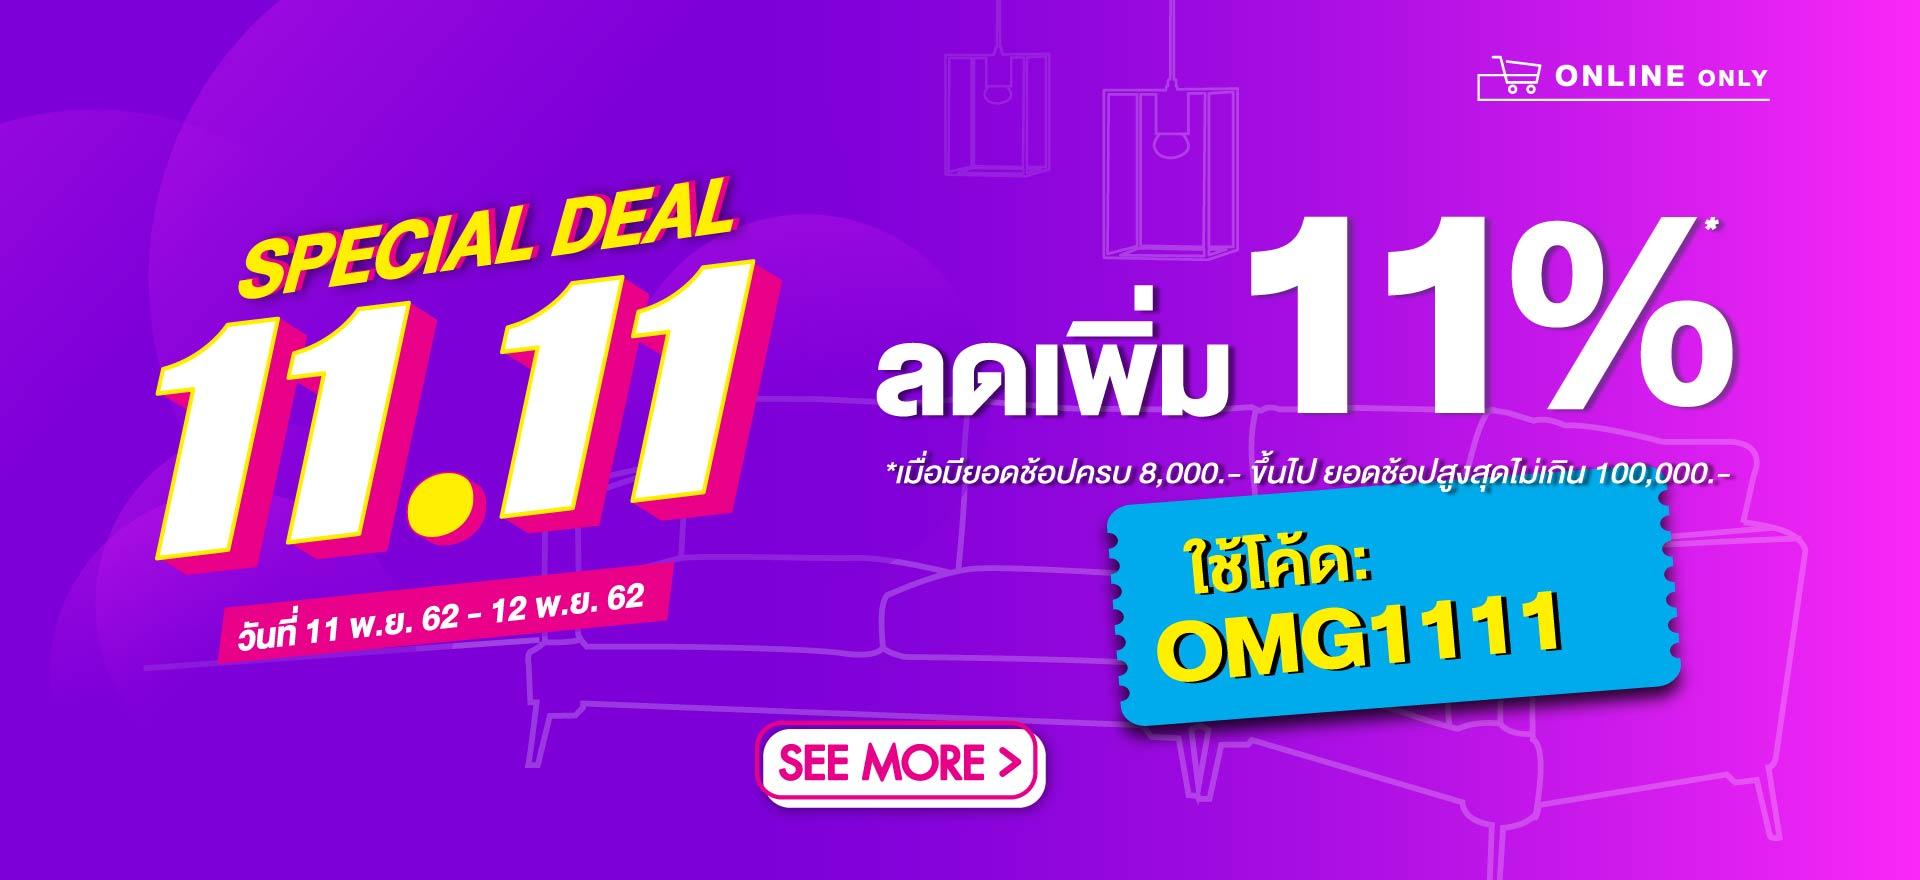 11.11 SPECIAL DEAL ลดเพิ่ม 11%